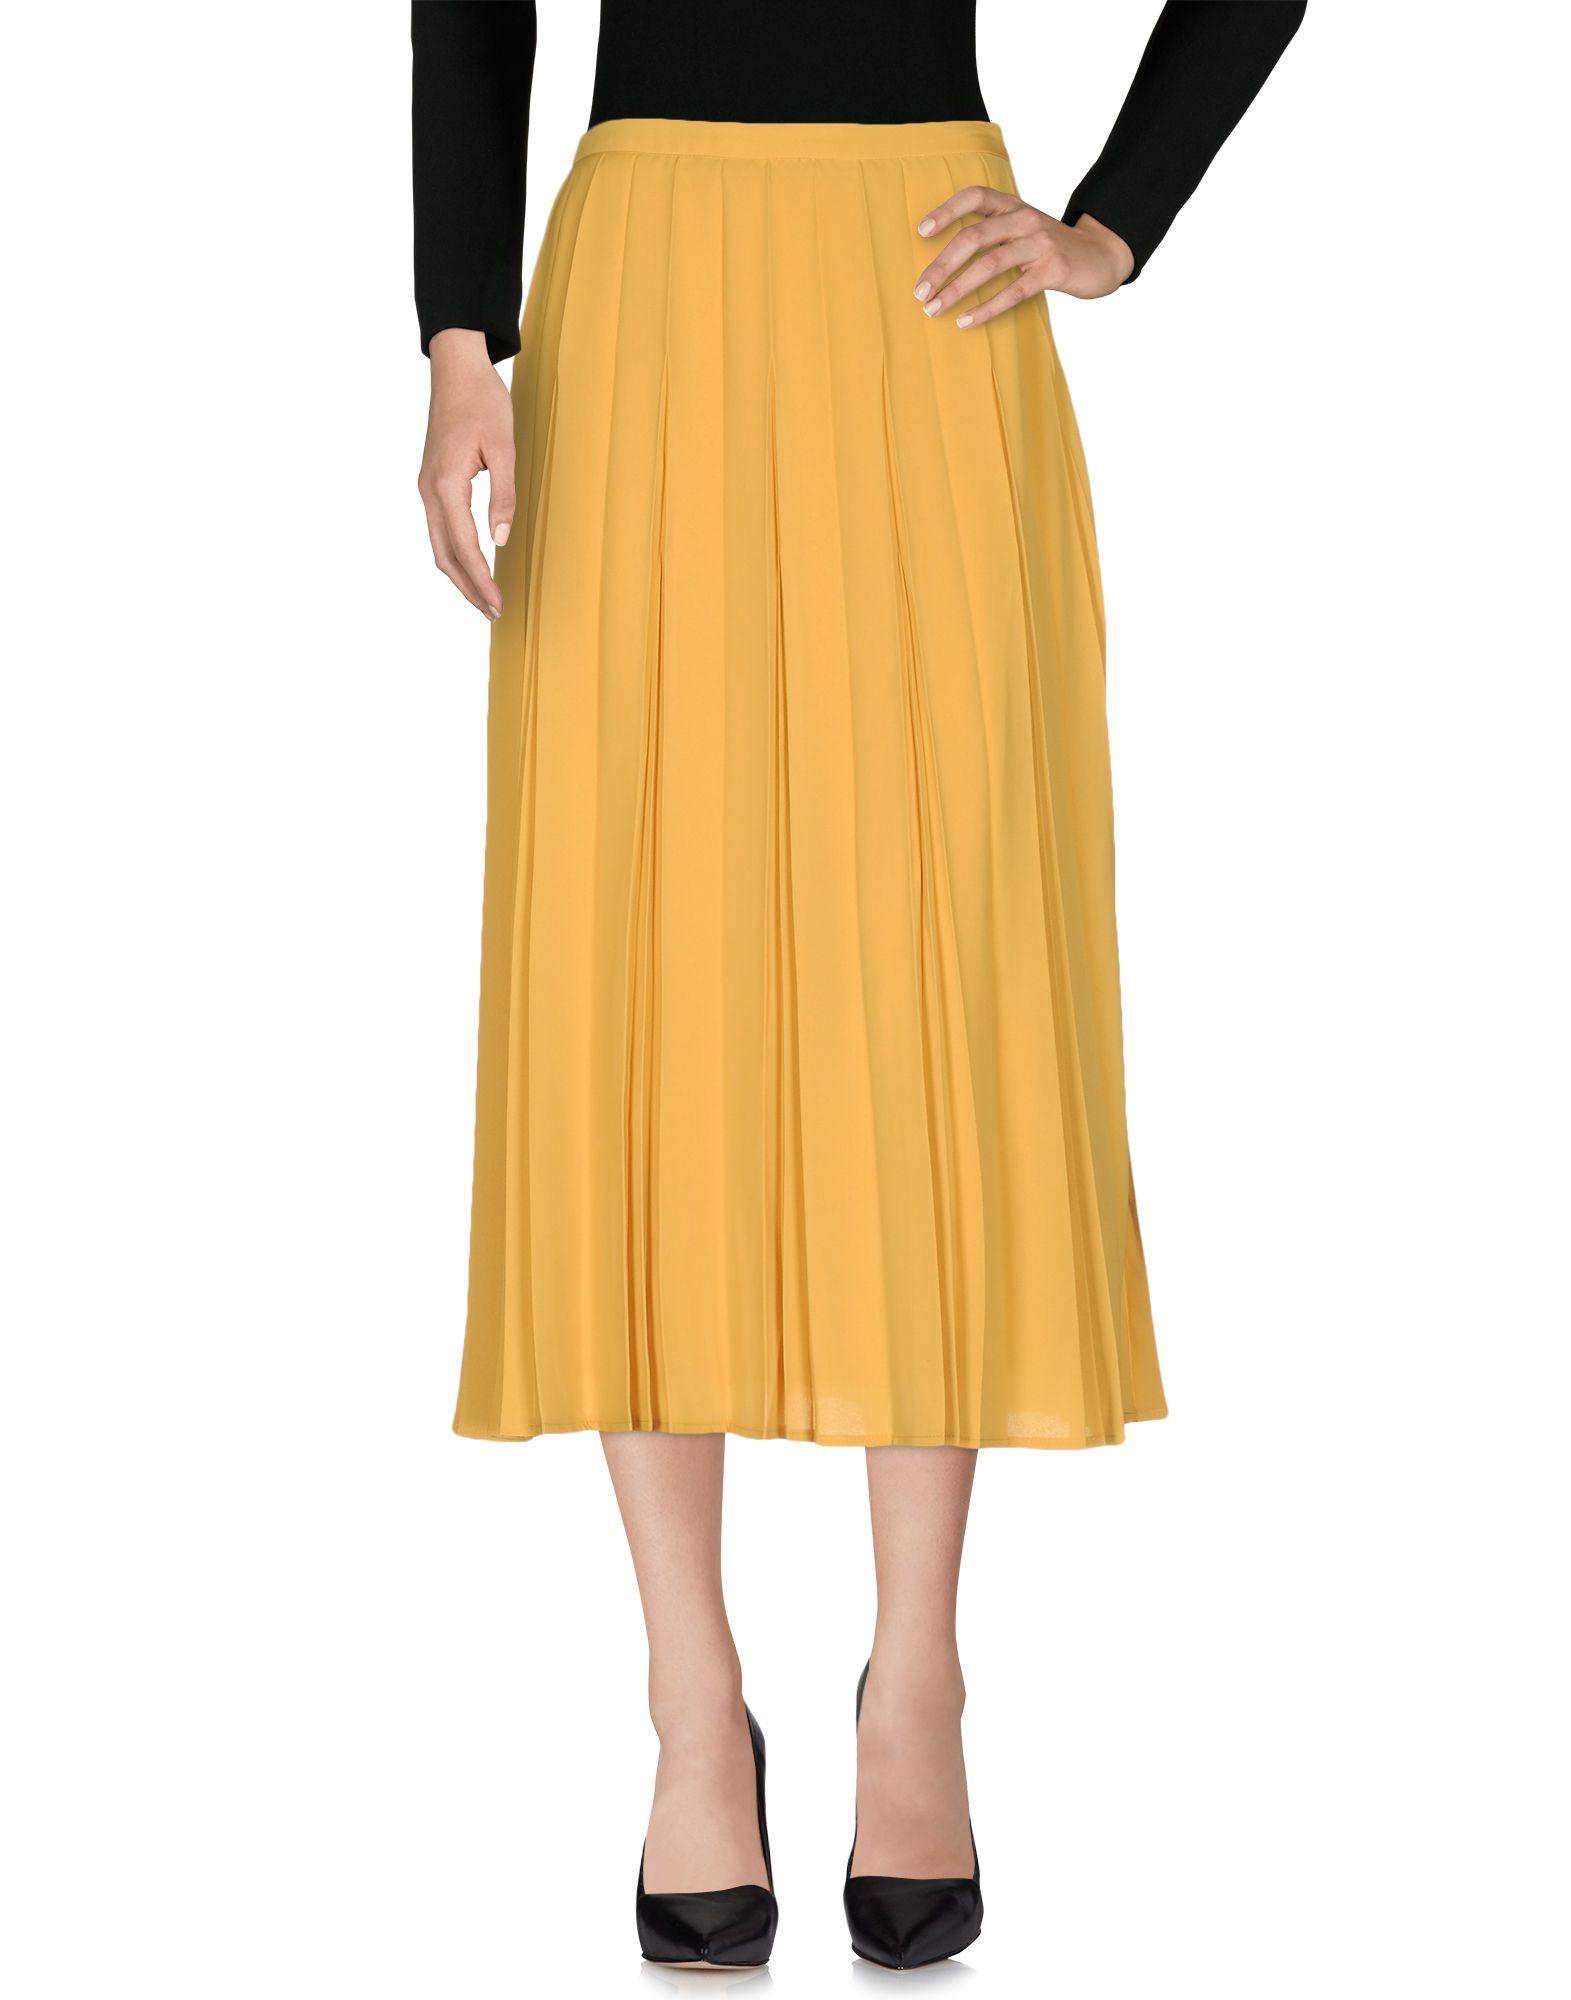 GAZEL 3/4 length skirts